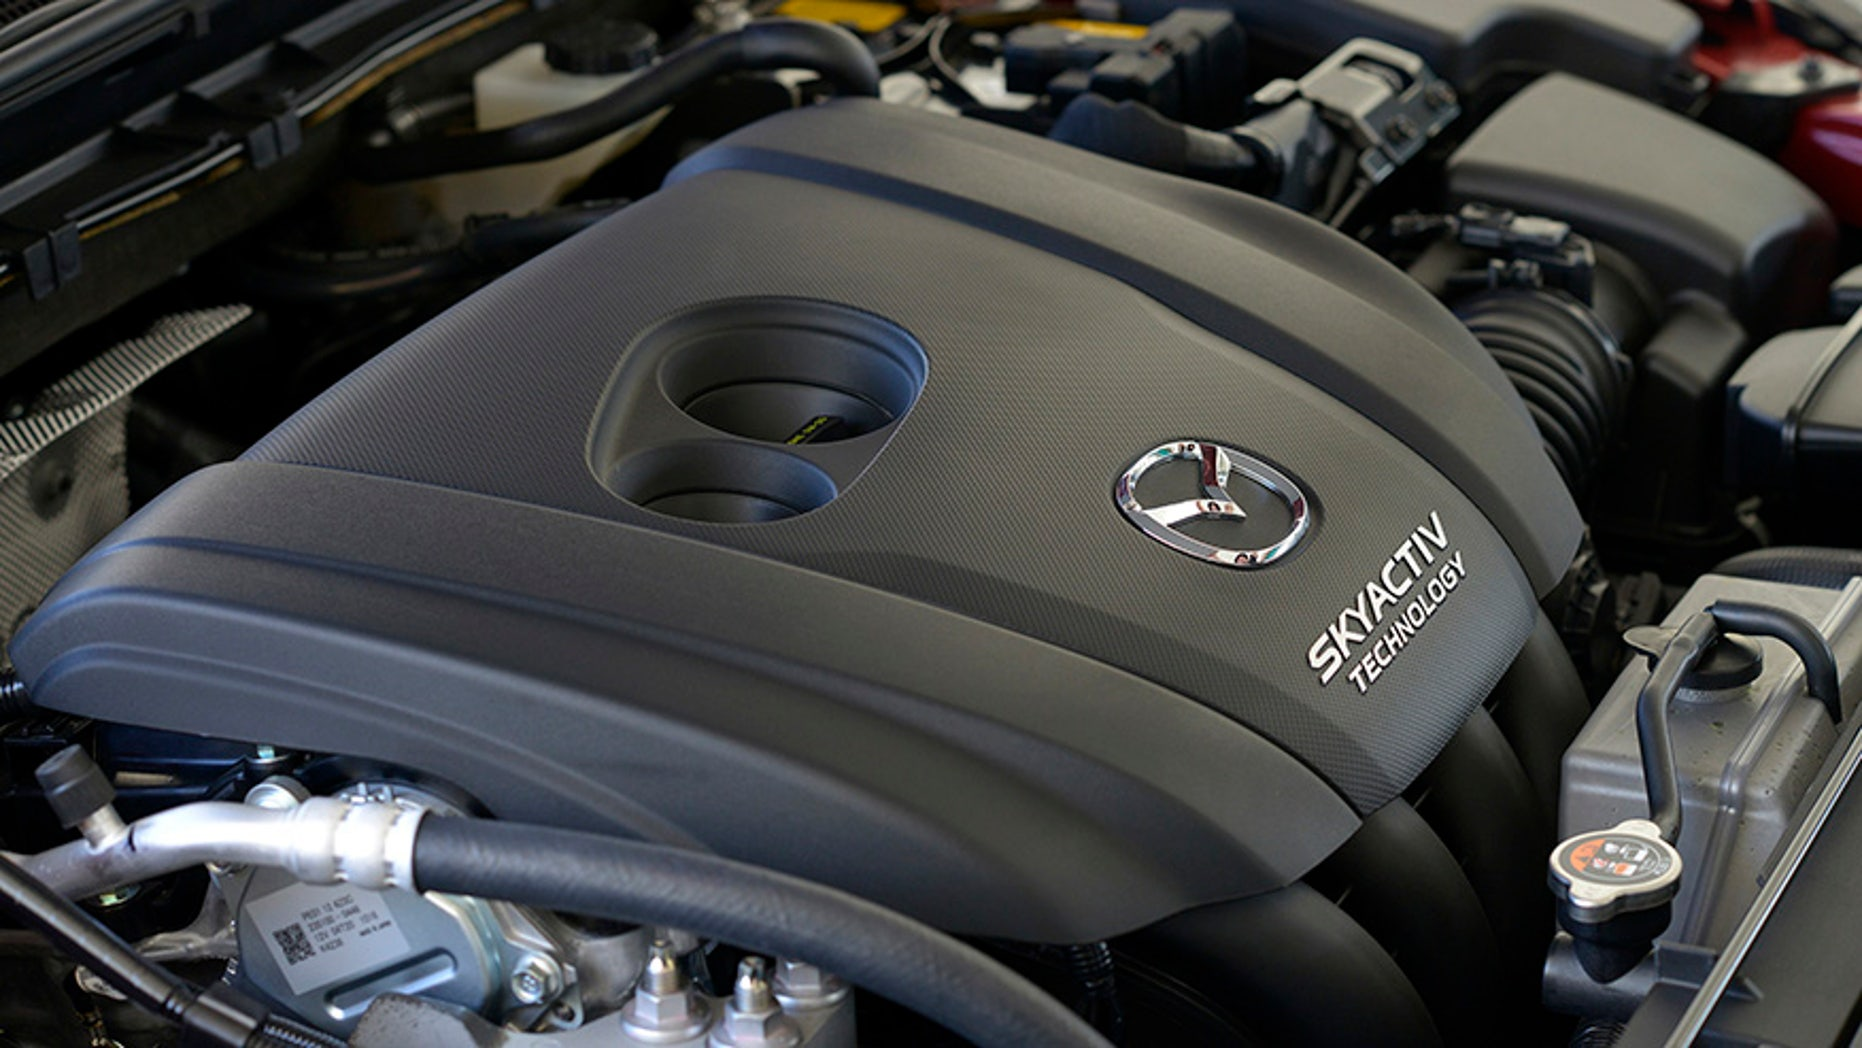 mazda introducing breakthrough spark less gasoline engine in 2019 rh foxnews com